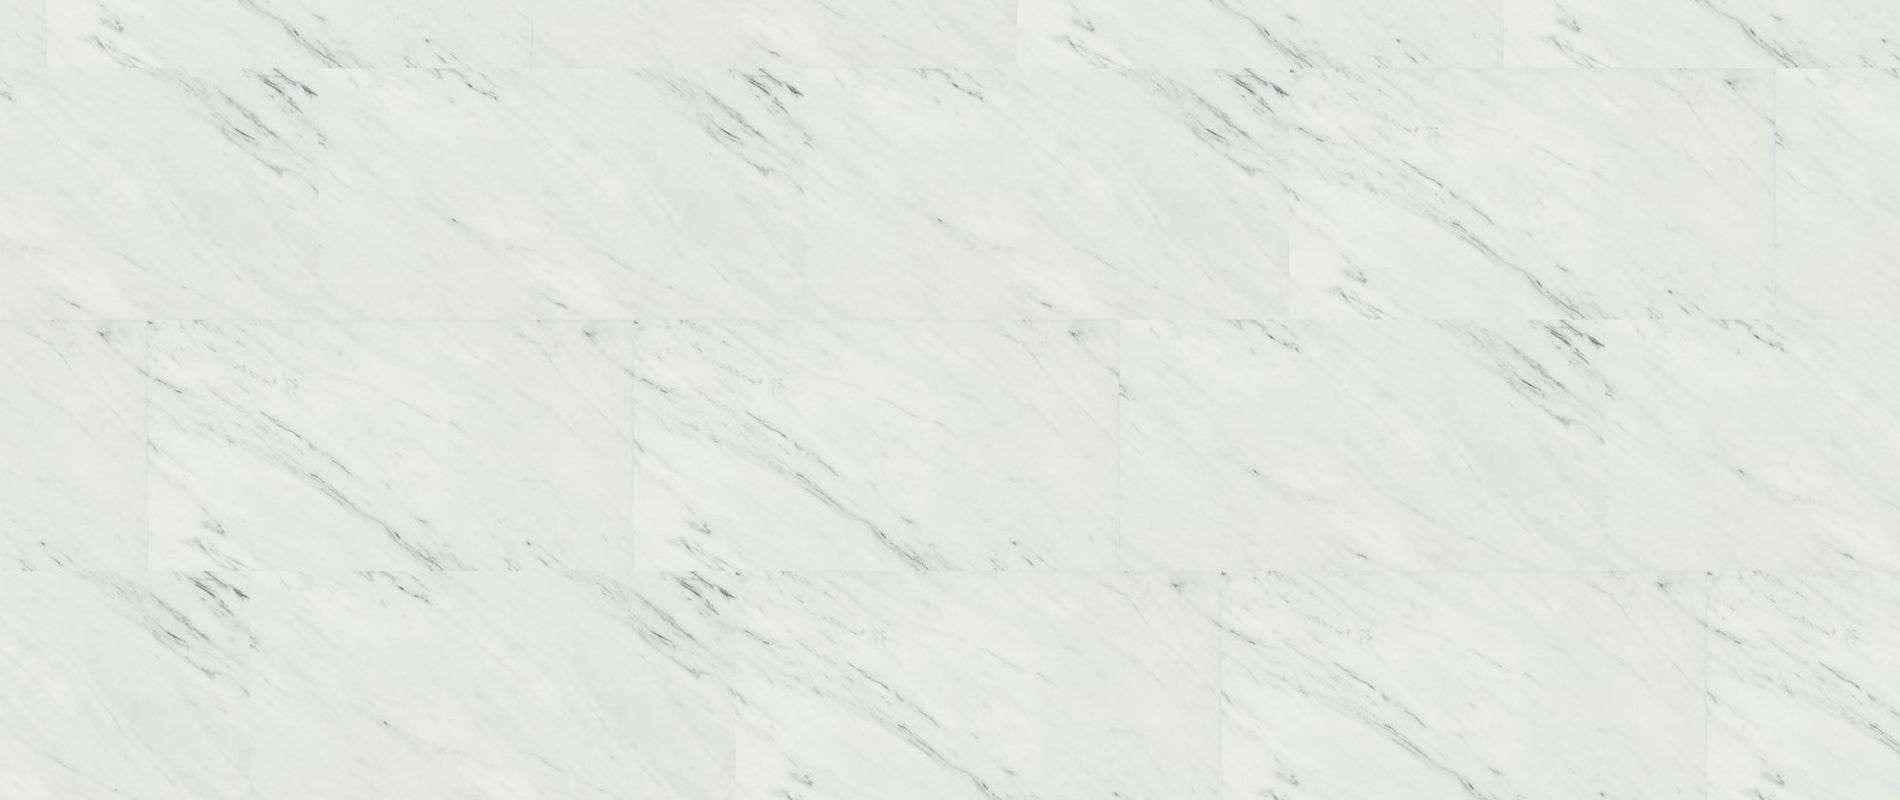 vinylboden fliesenoptik wei vb57 hitoiro. Black Bedroom Furniture Sets. Home Design Ideas